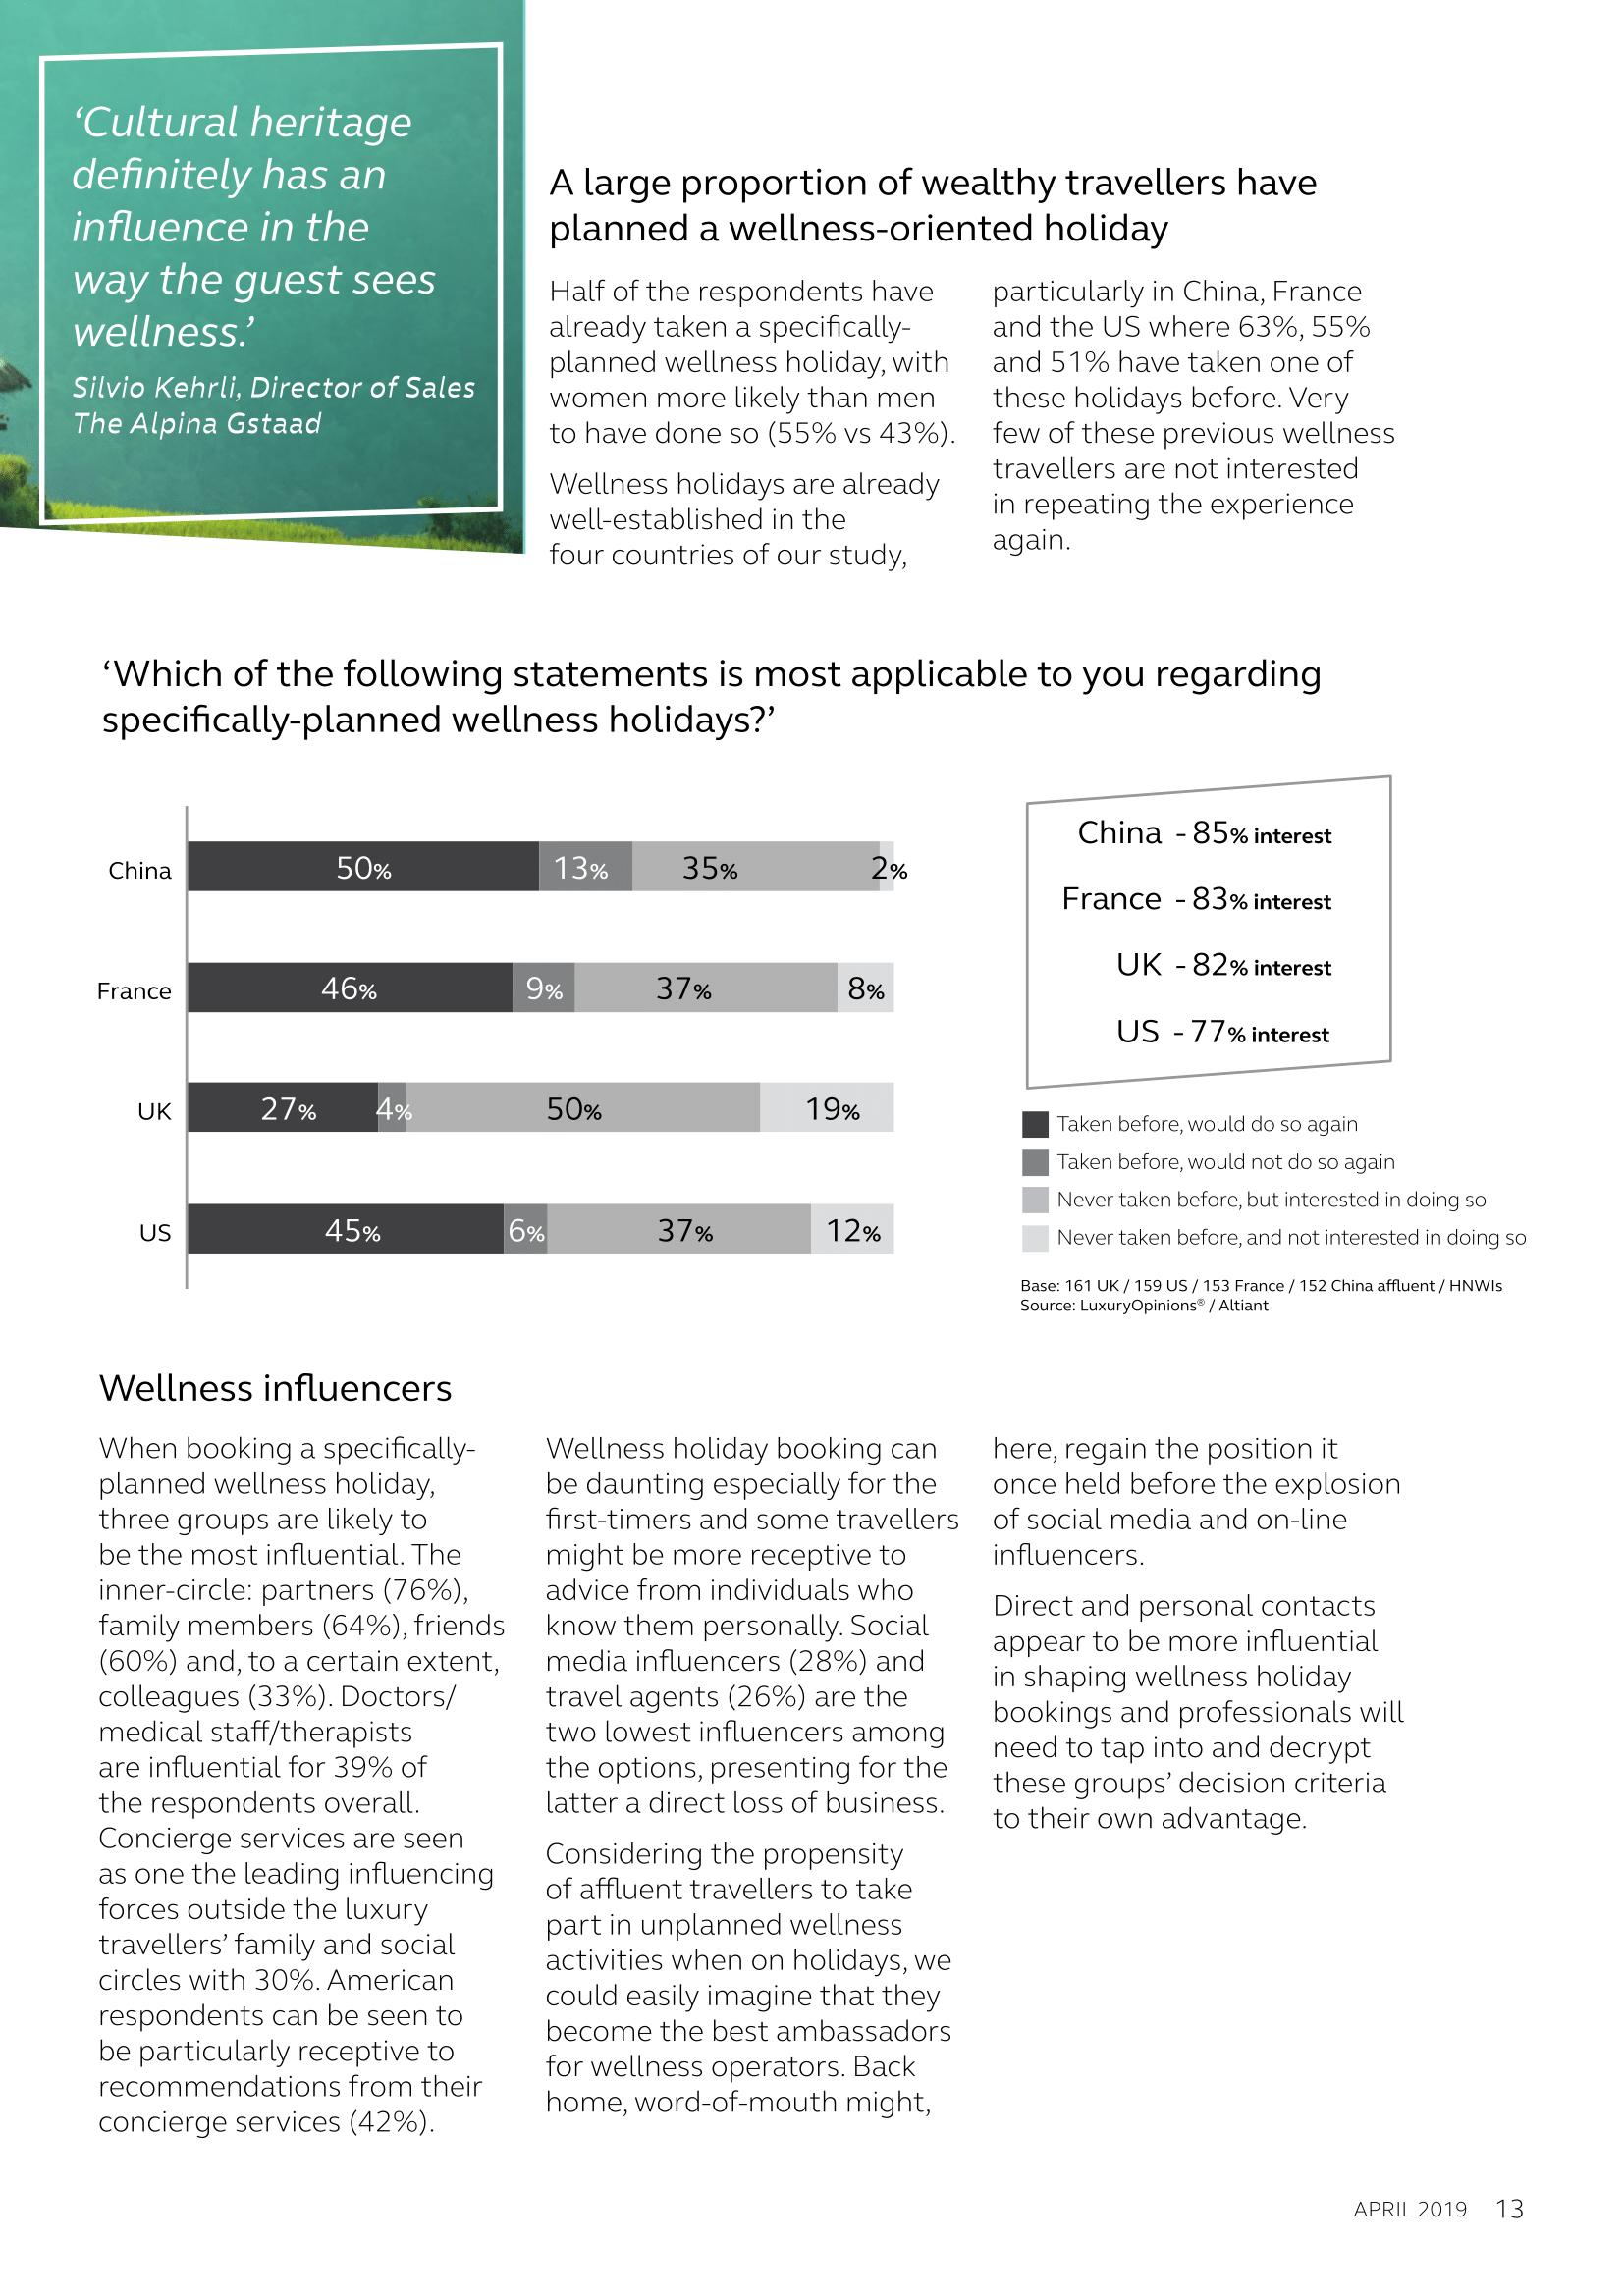 ILTM_Altiant_Report-13.png